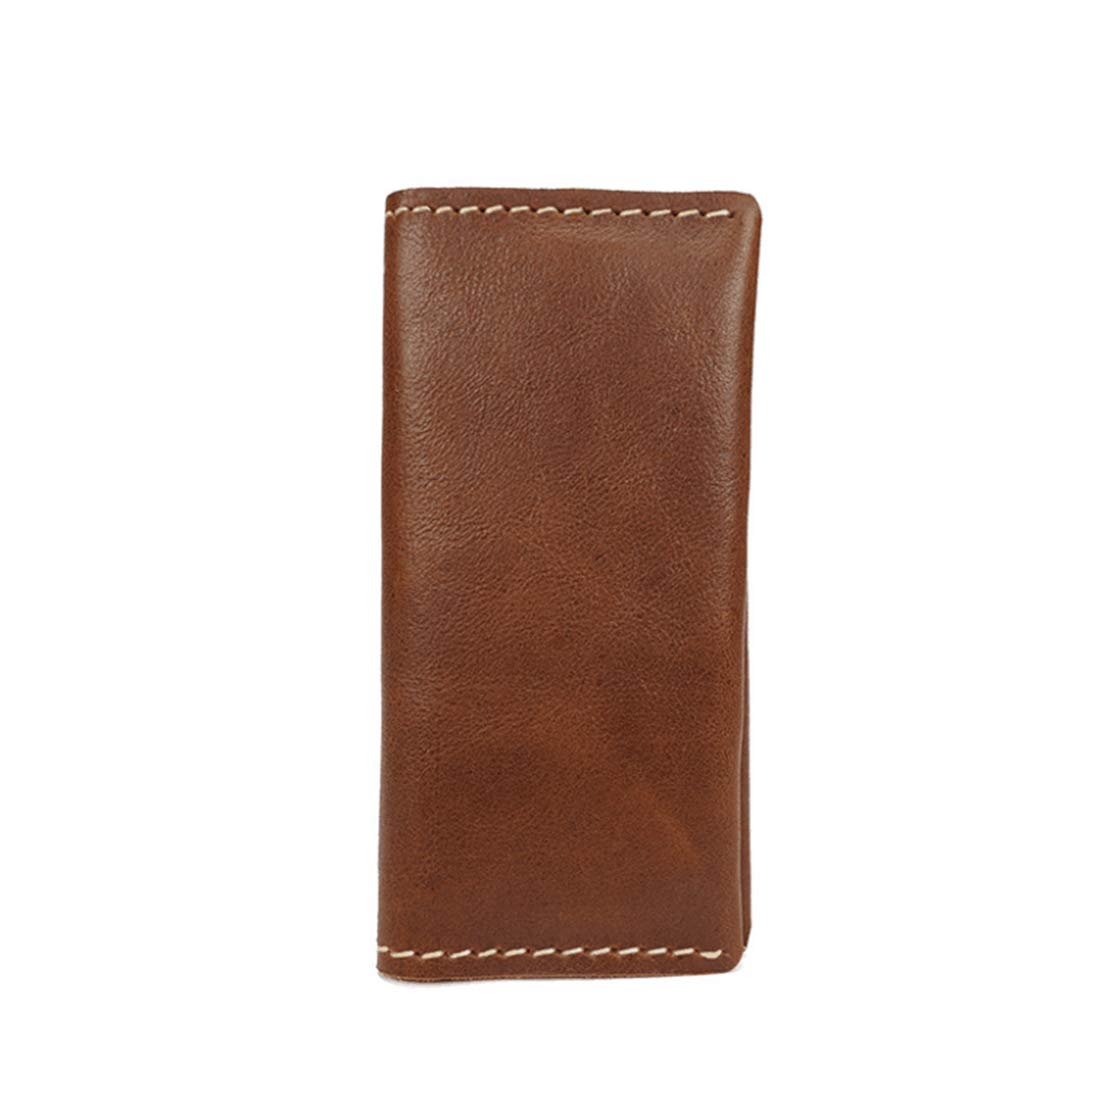 KRPENRIO Mens RFID Blocking Genuine Leather Long Bifold Wallet Color : Brown2